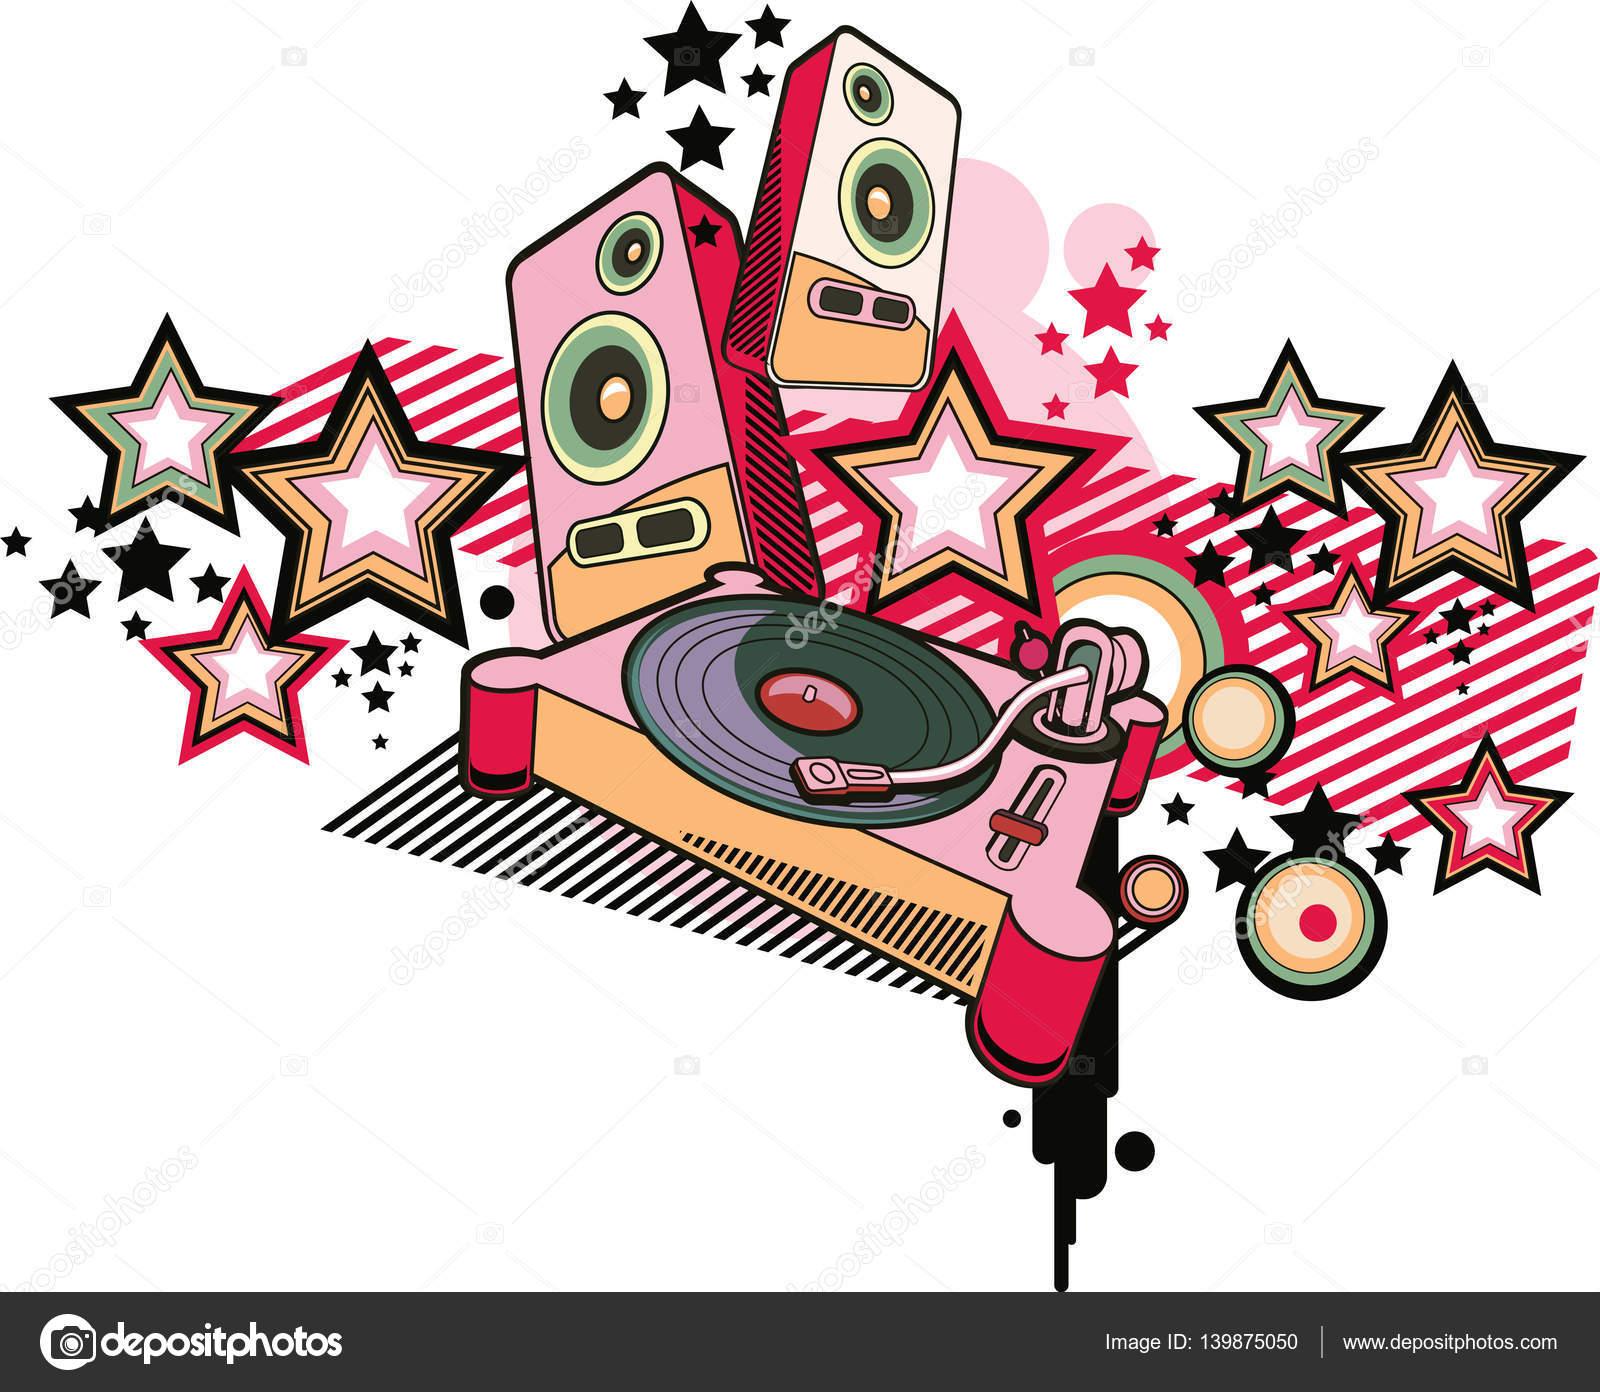 Music design turntable graffiti stock vector